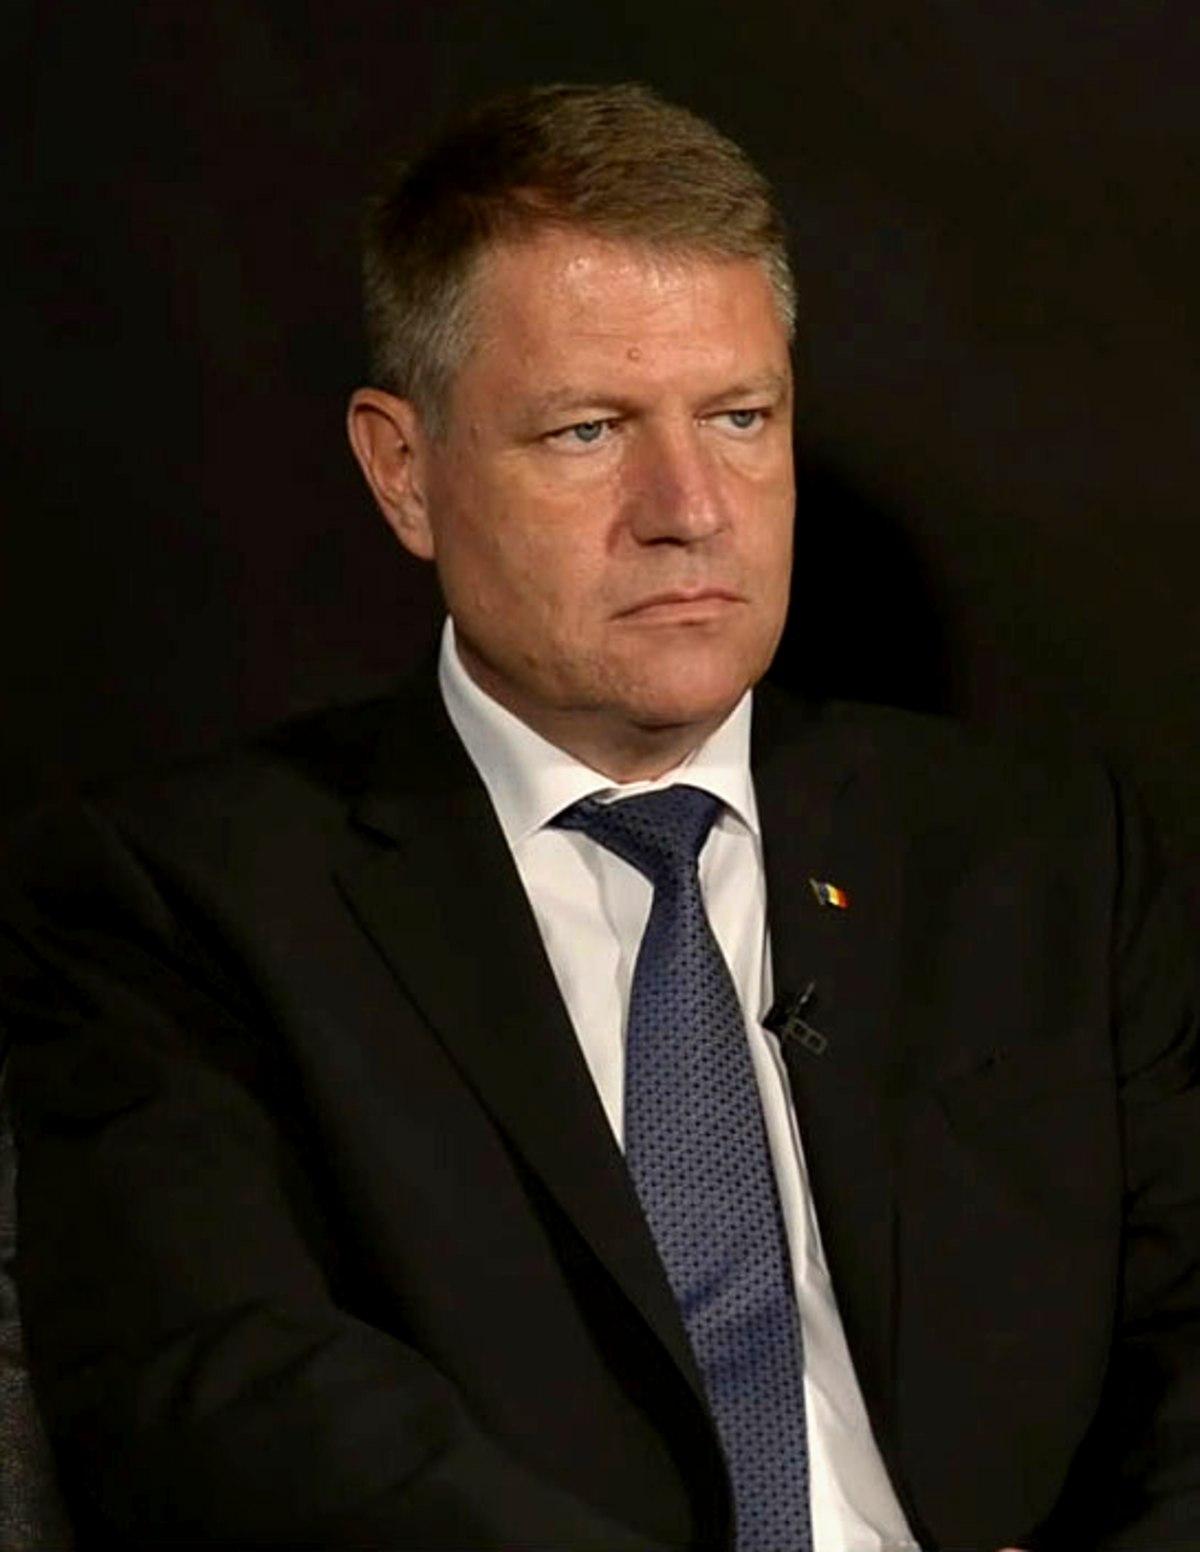 Klaus Iohannis - Wikipedia